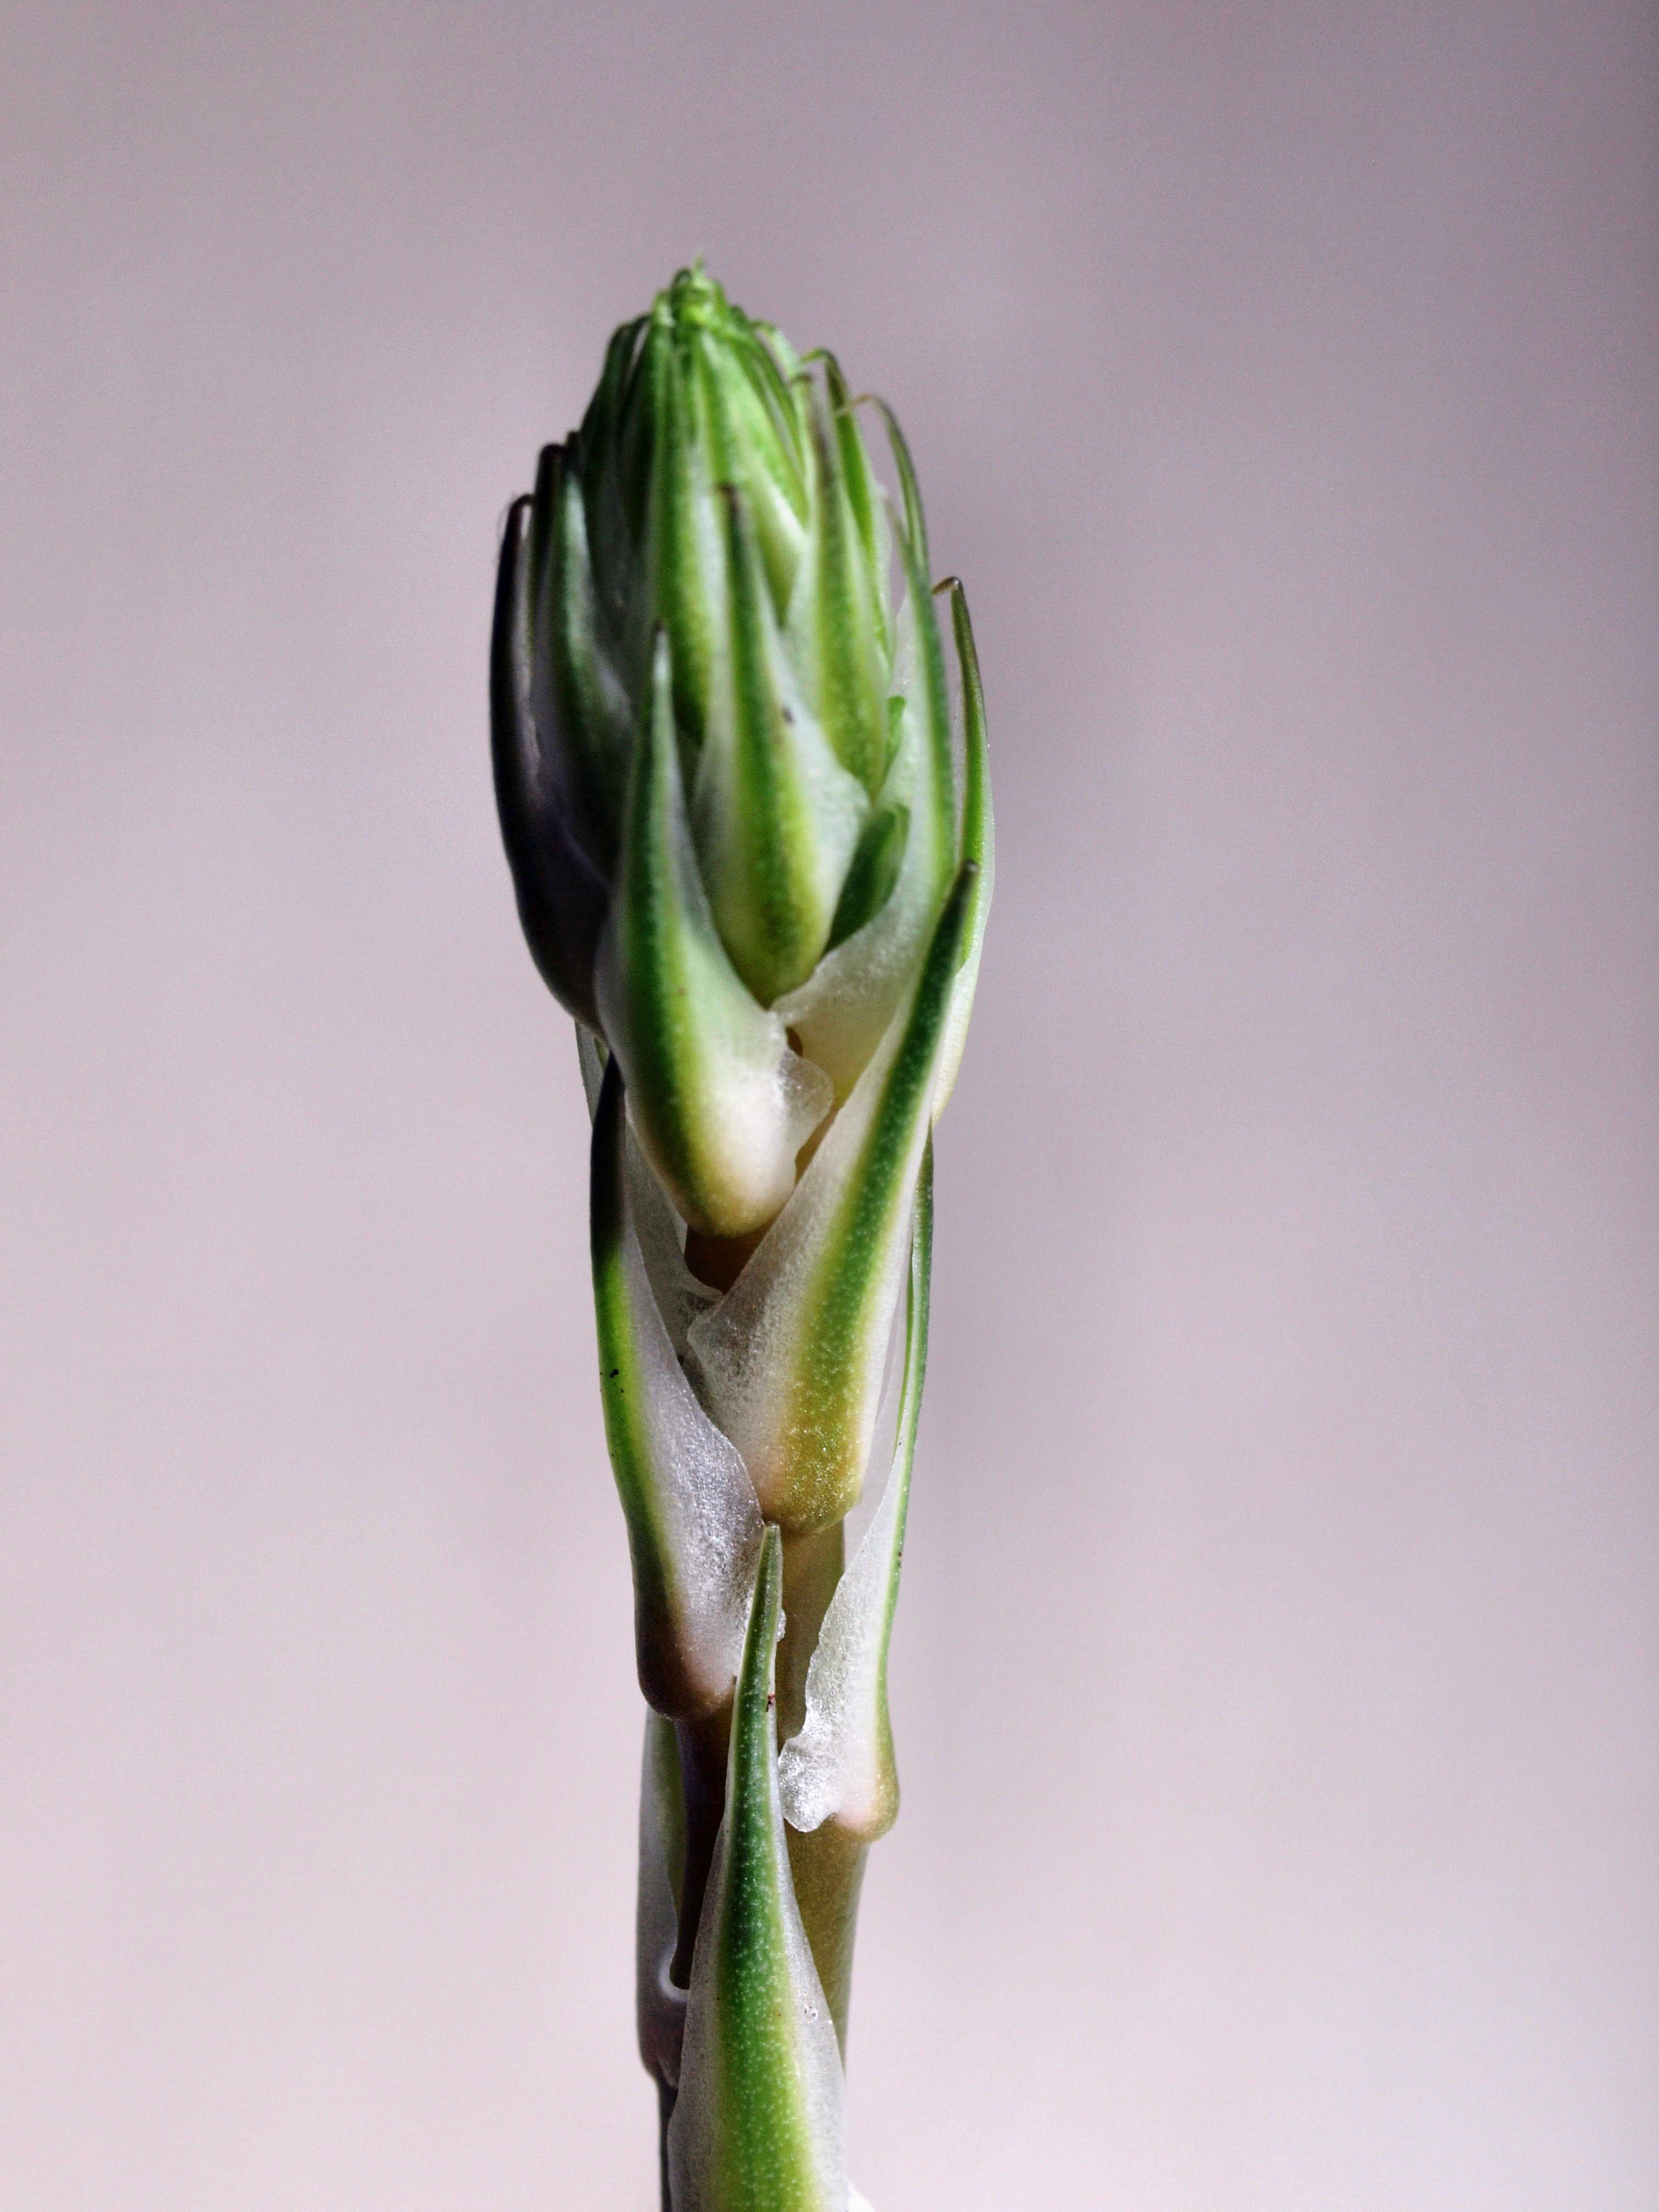 Succulent-2-2.jpeg